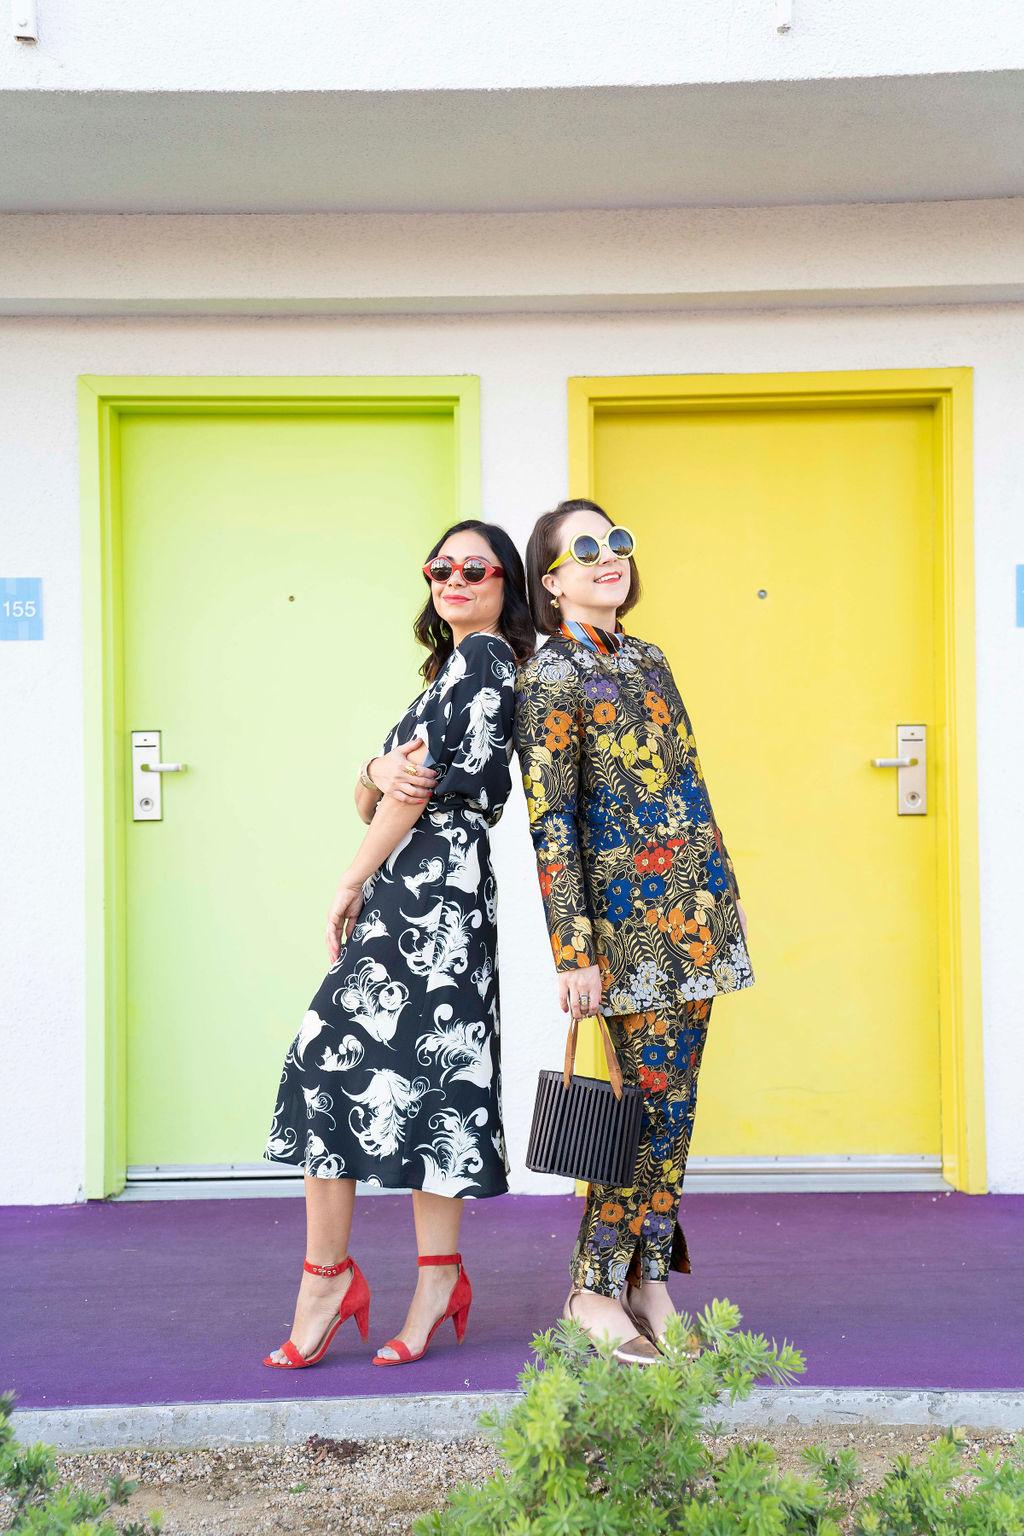 Zac Posen floral black dress & brocade jacket and Friedrich's Optik sunglasses worn by Charleston bloggers Charleston Weekender & Charleston Shop Curator